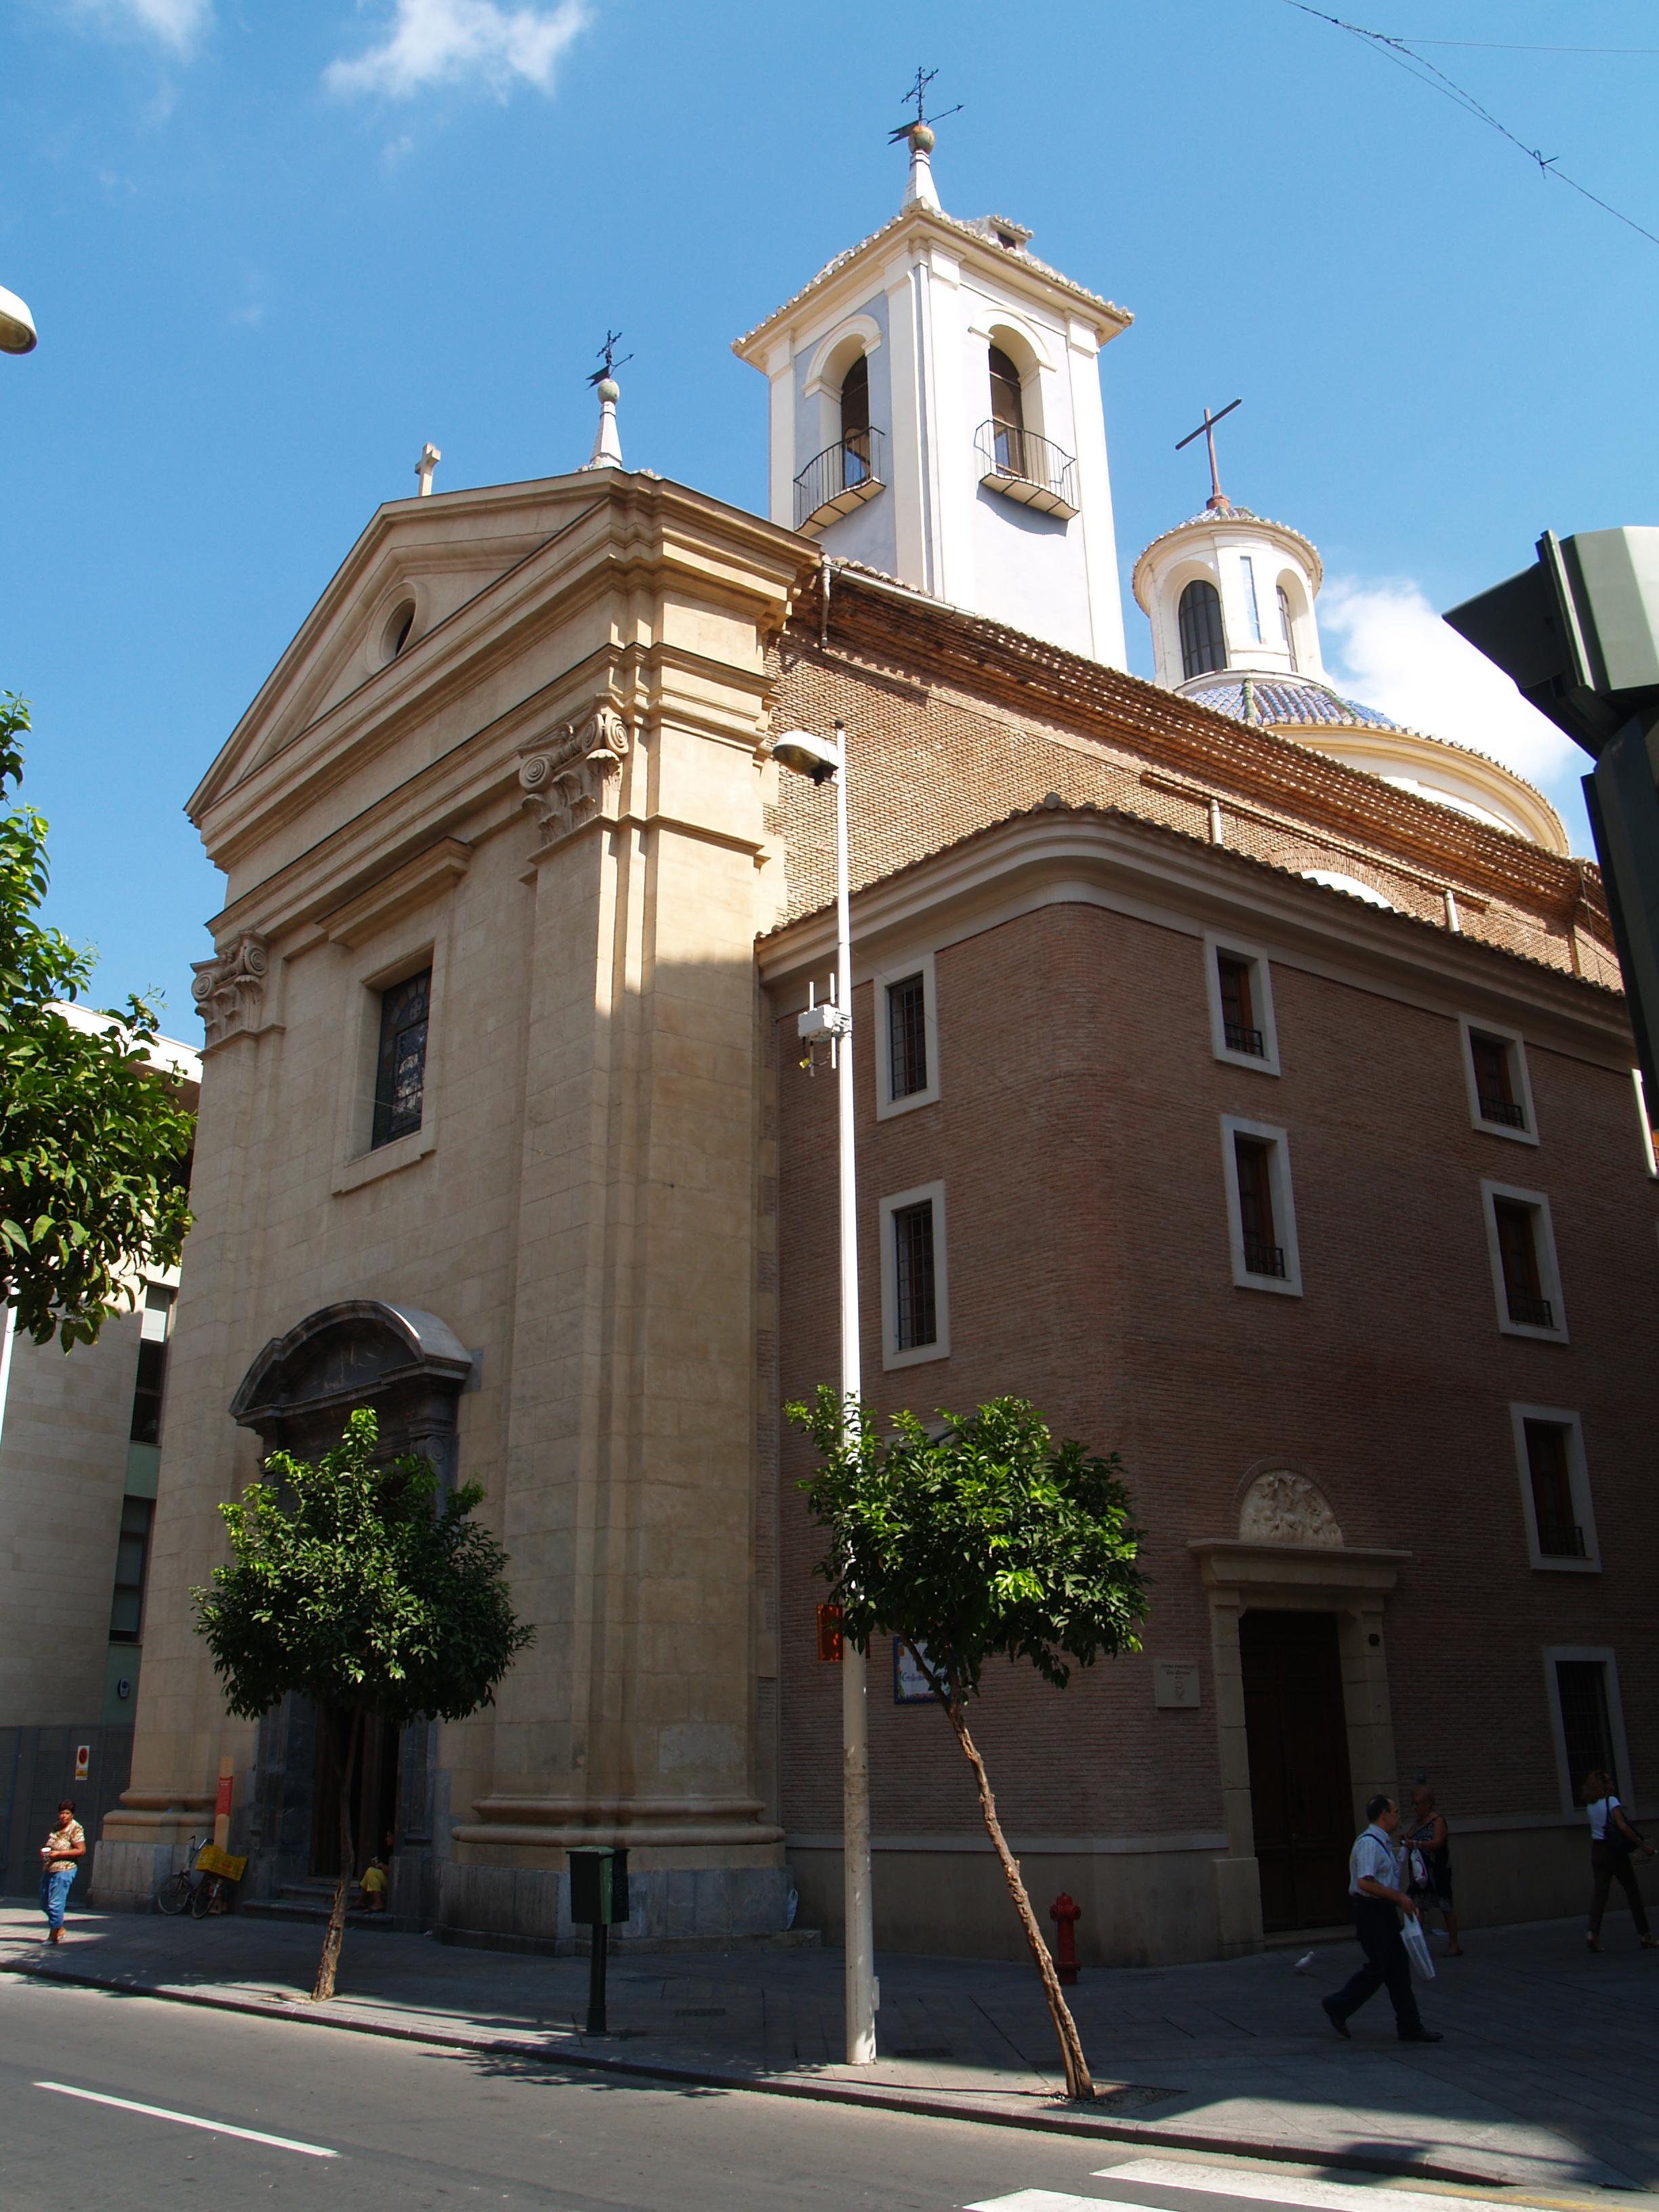 File:Iglesia de San Lorenzo (Murcia).jpg - Wikimedia Commons